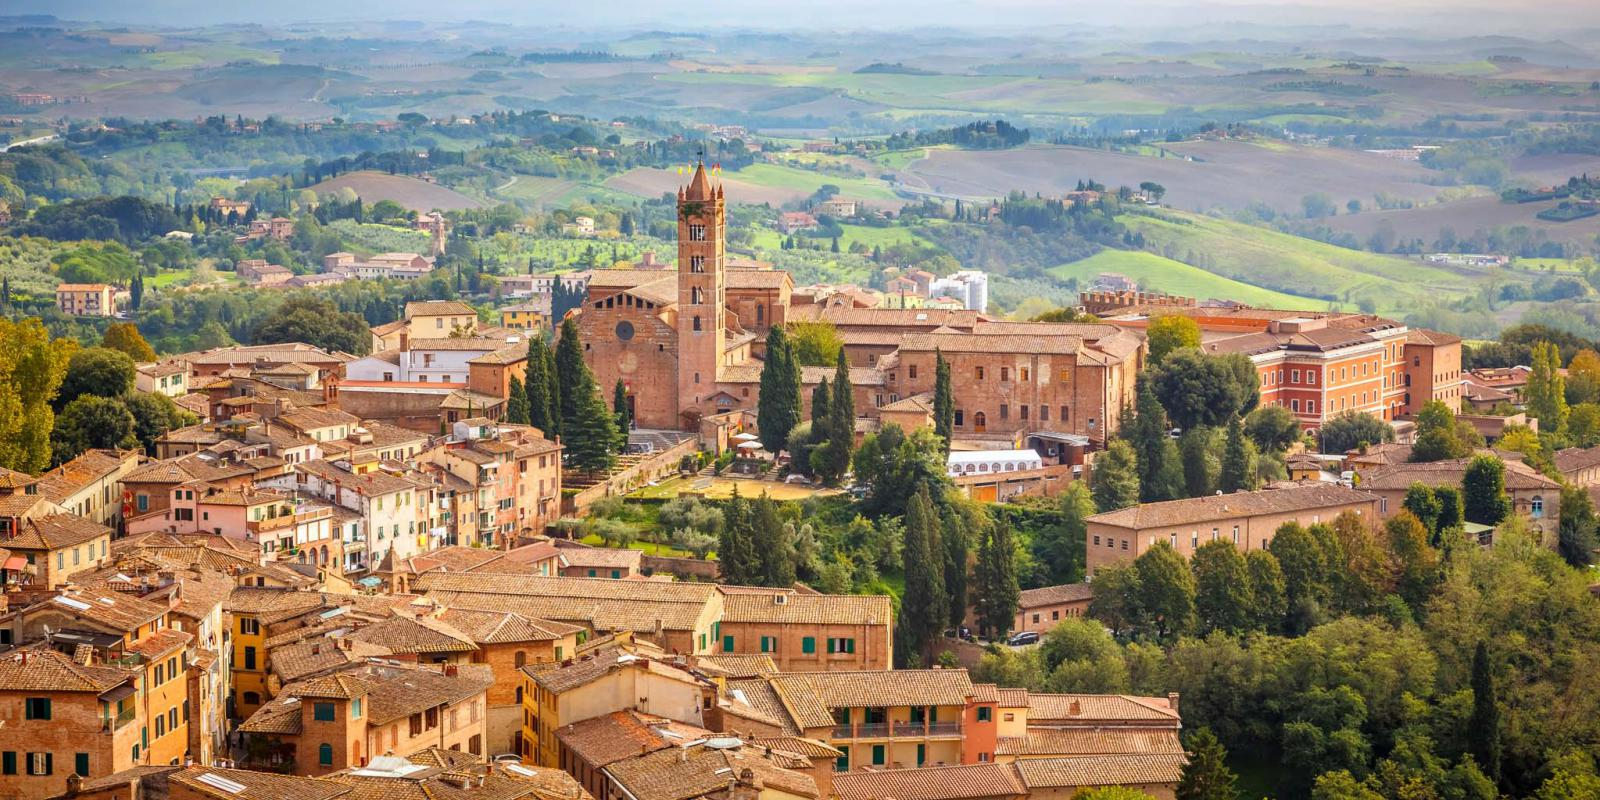 Panorama di Siena dall'alto | Tuscany